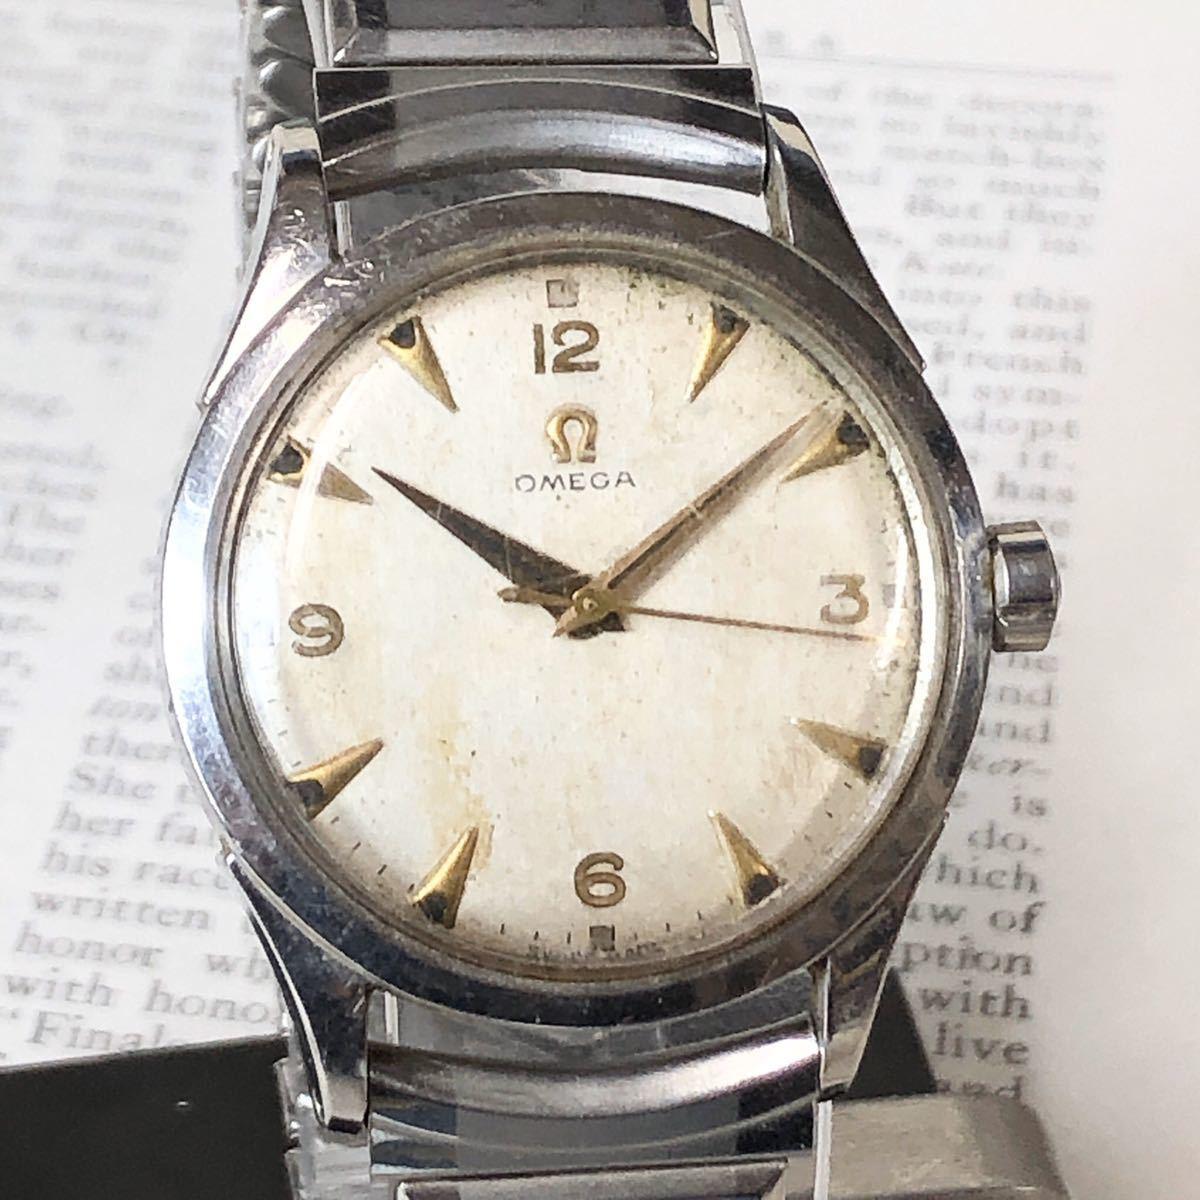 OMEGA オメガ 腕時計 機械式 自動巻 ハーフロータリー SWISS MADE スイス SS 3針 ビンテージ 希少 値下げ交渉あり 稼動品 W1519_画像1